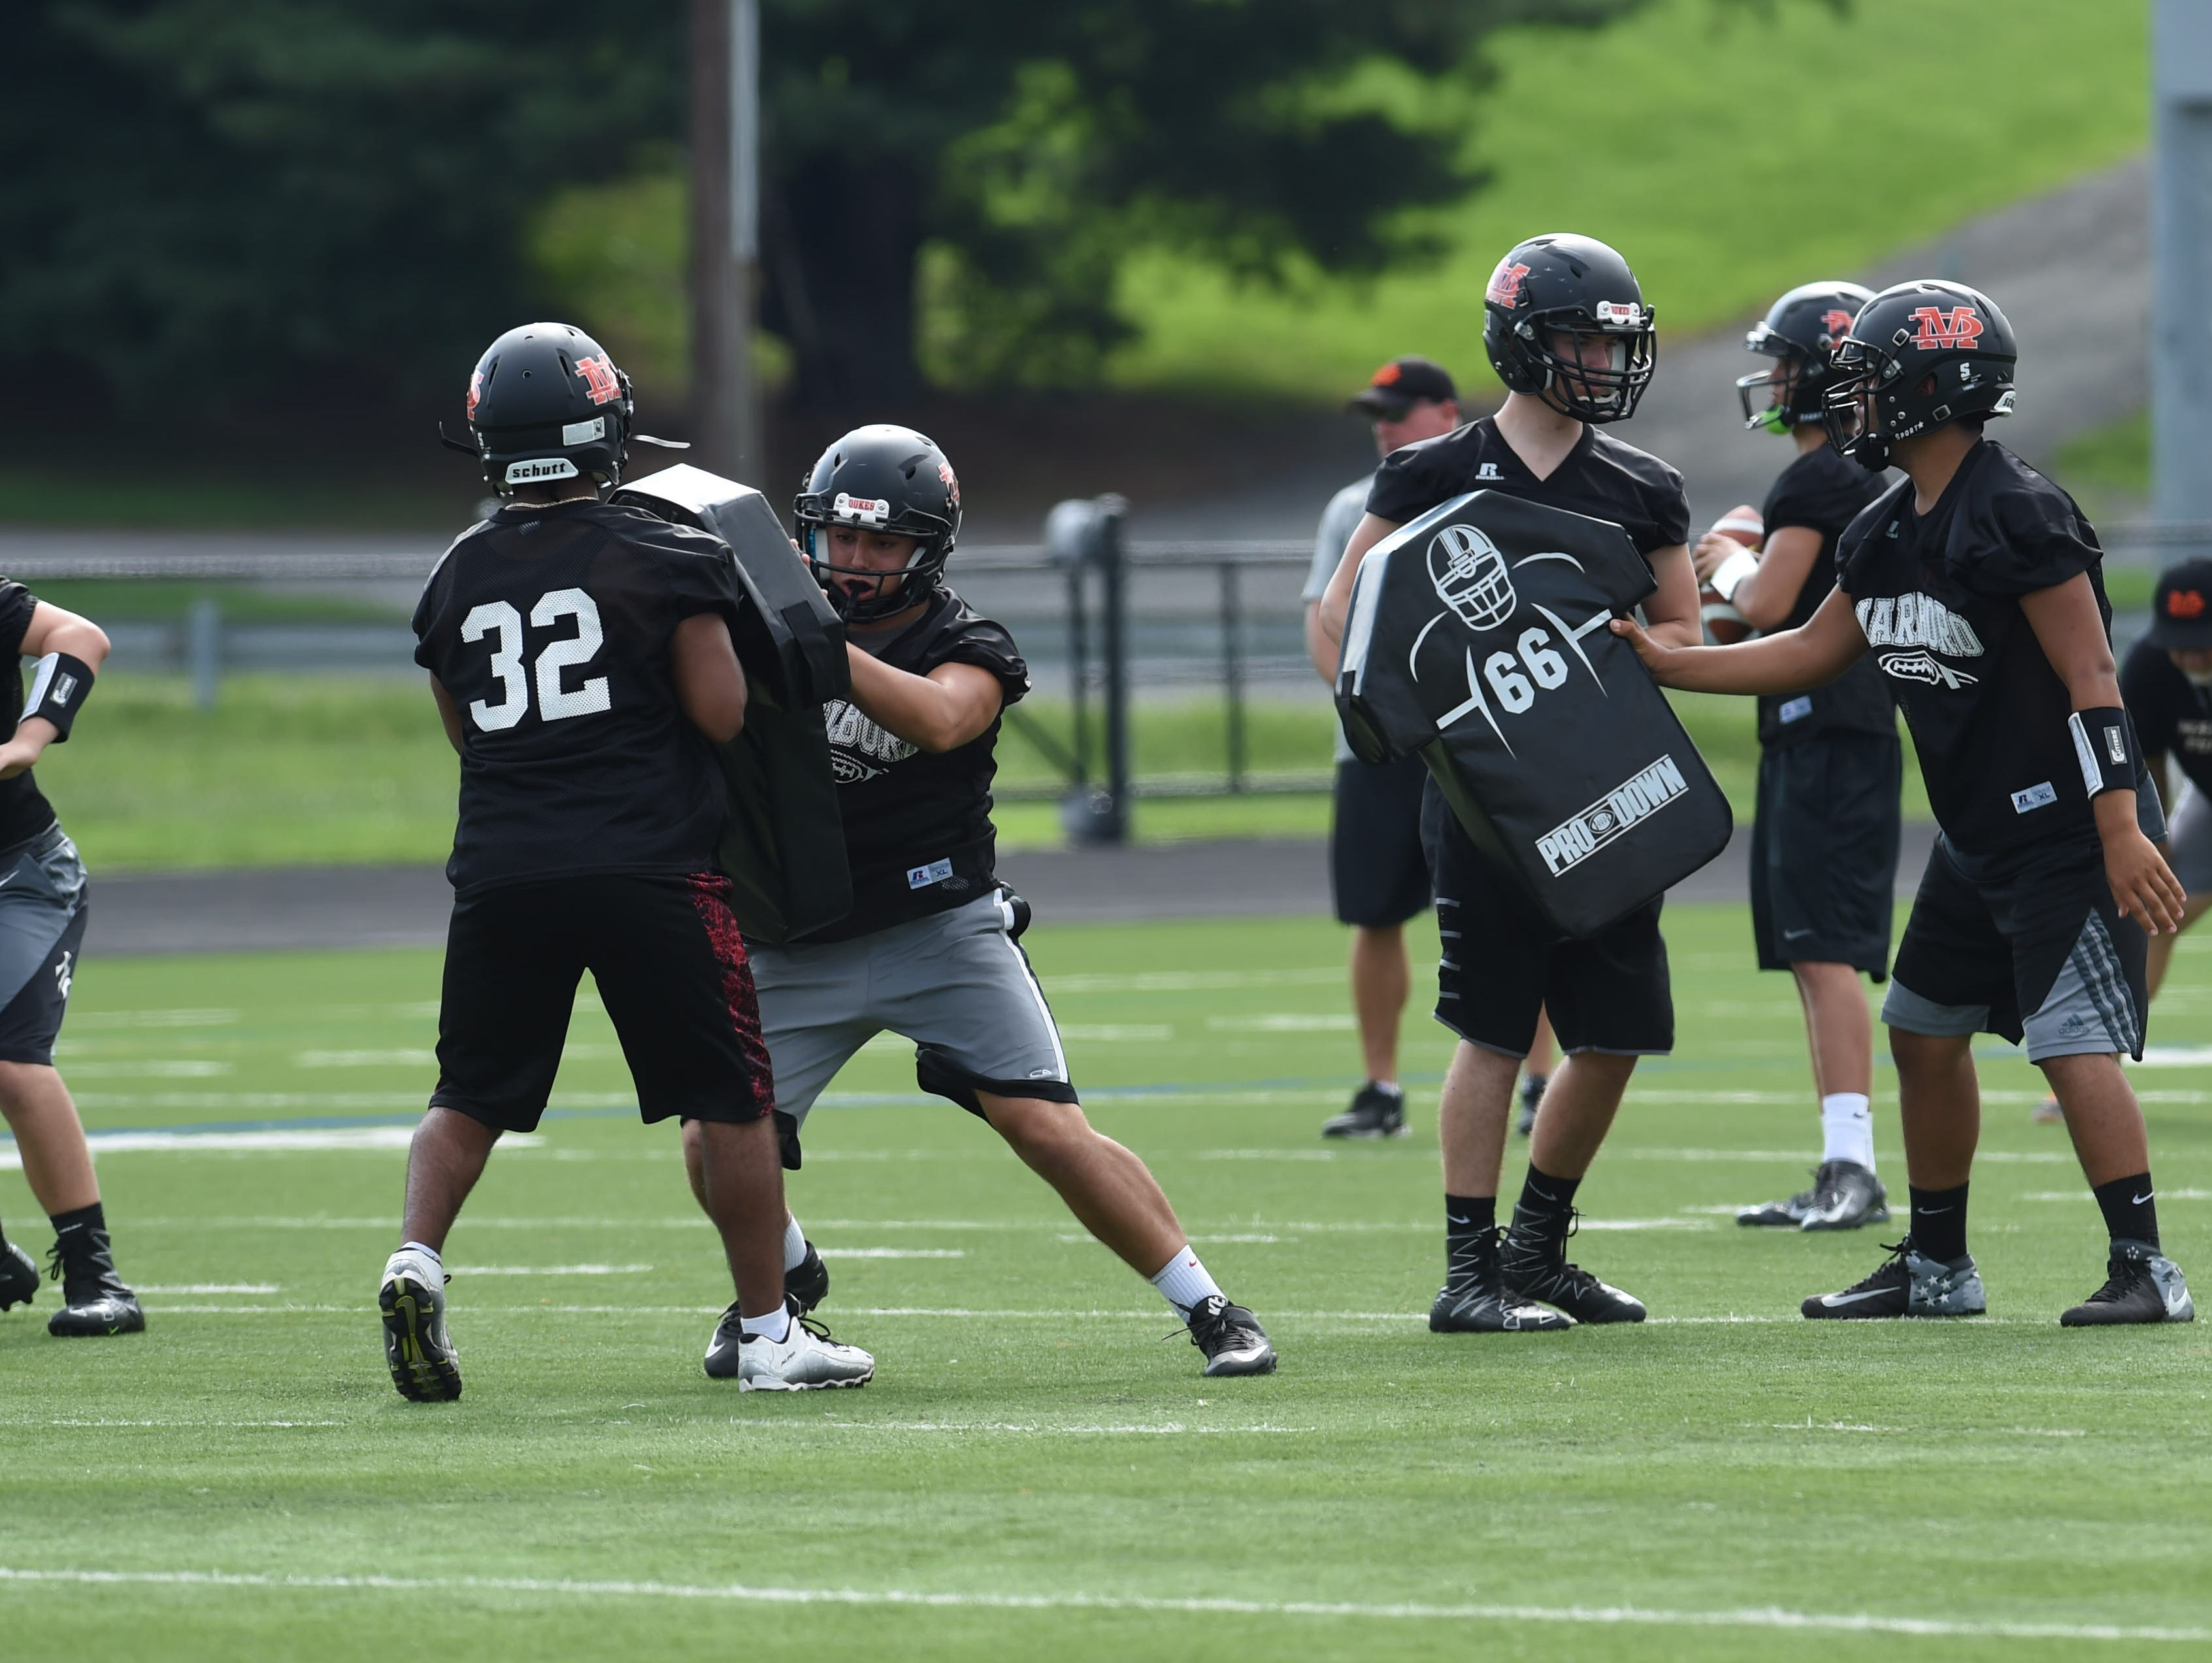 Junior Nico Ramos, left, blocks a teammate during football preseason practice at Marlboro High School.